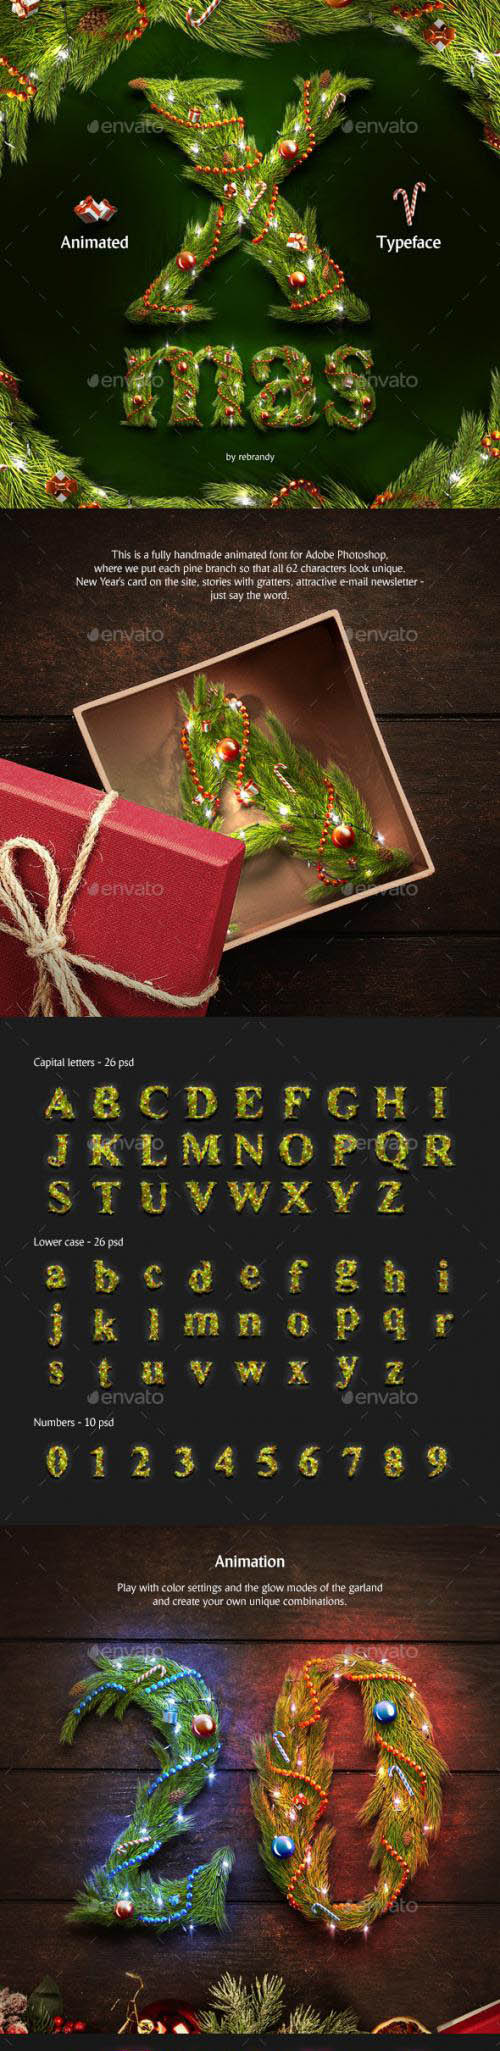 Christmas Animated Typeface - 24819053